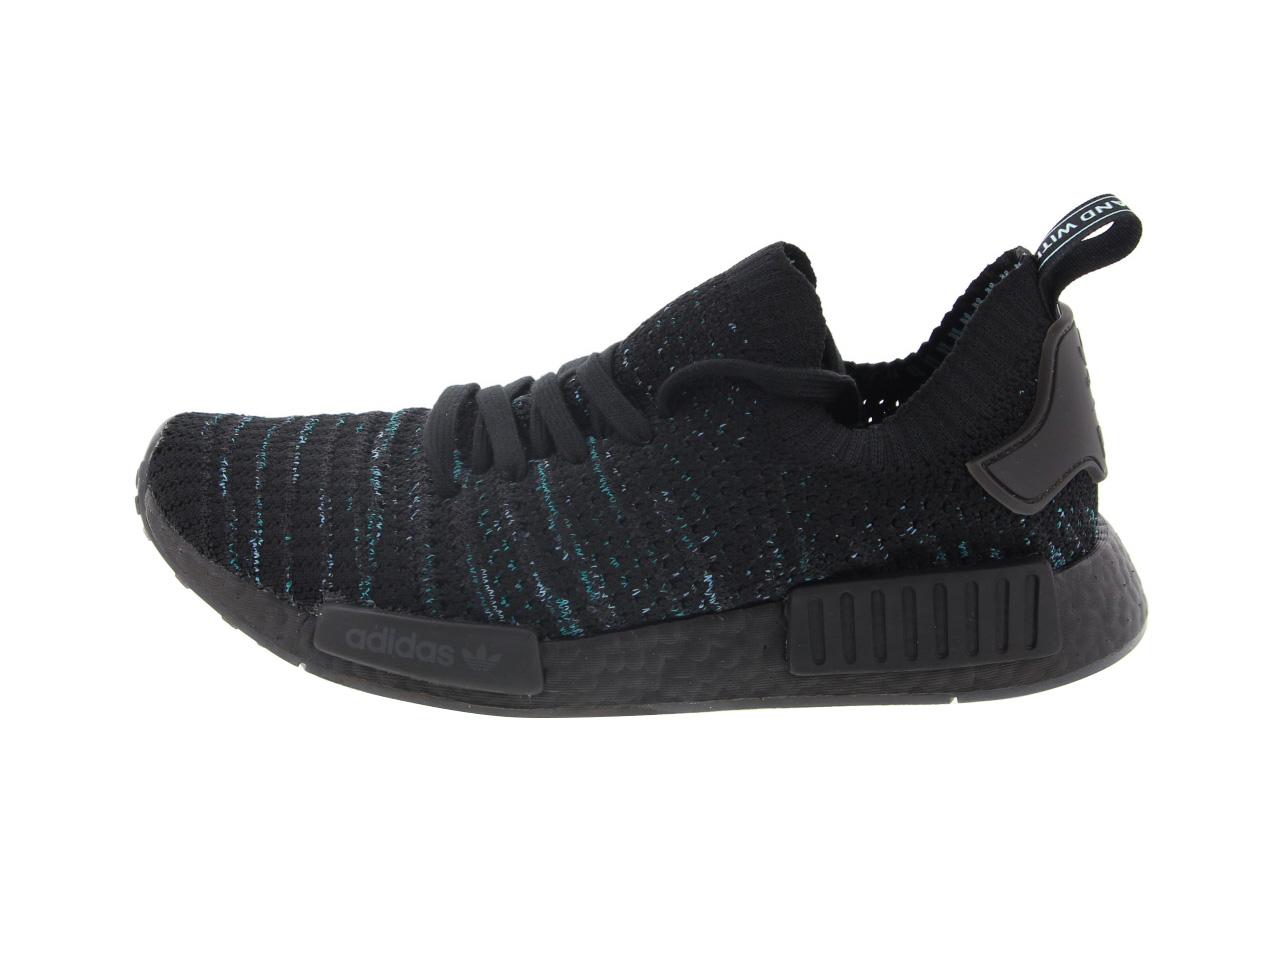 【60%OFF!】adidas NMD_R1 STLT PARLEY PK(AQ0943)【アディダス NMD R1 STLT パーレイ プライムニット】【メンズファッション】【シューズ】【スニーカー】【靴】【フットウェア】